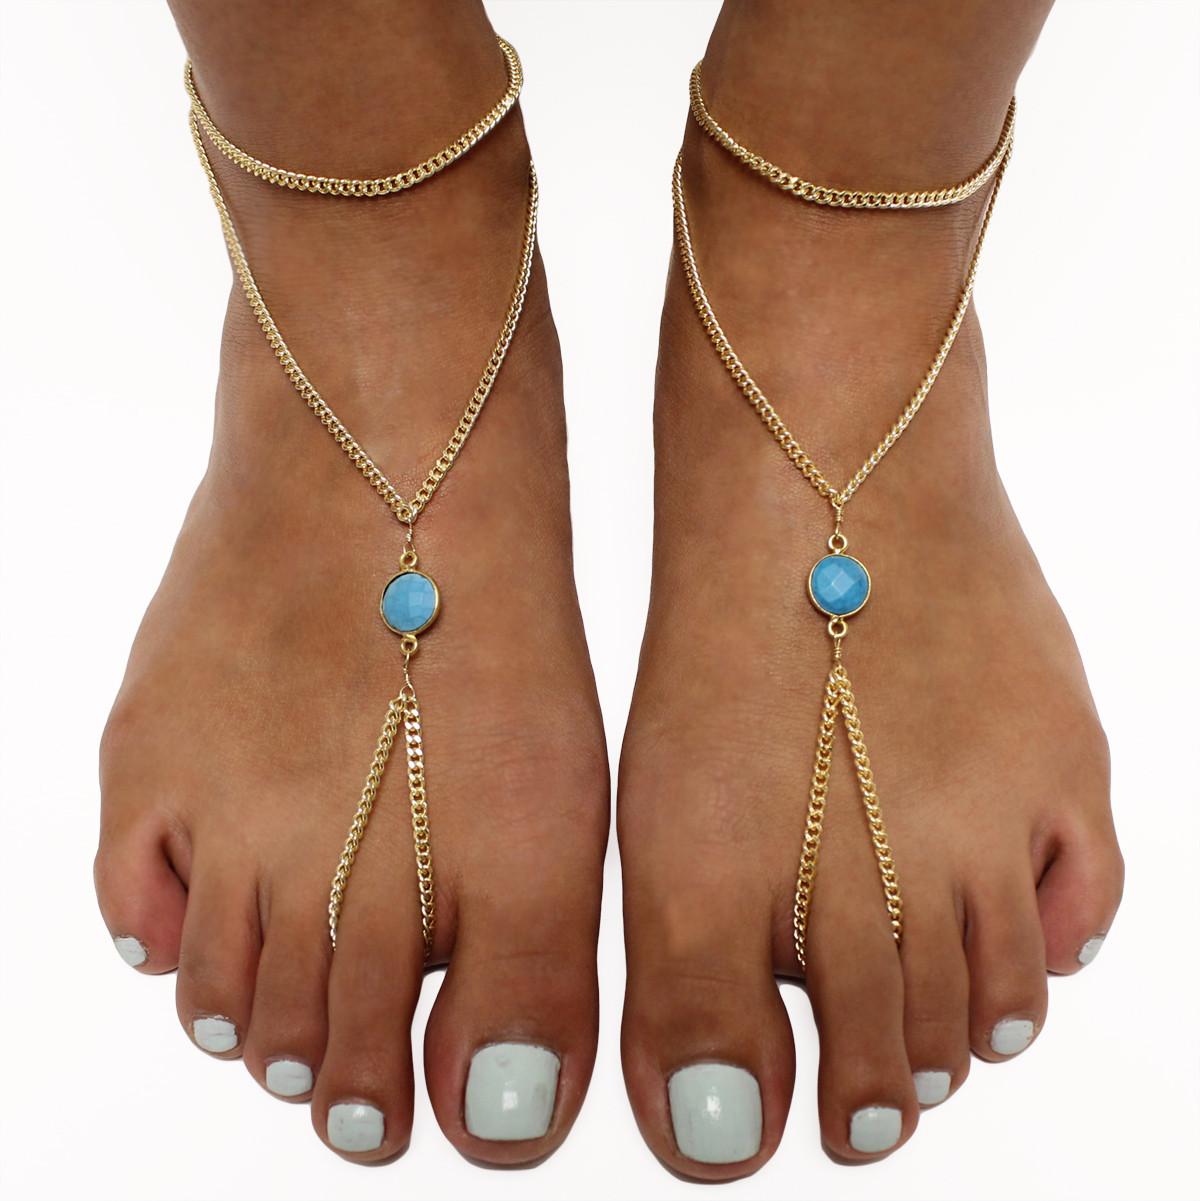 Gemstone foot chain – vidakush